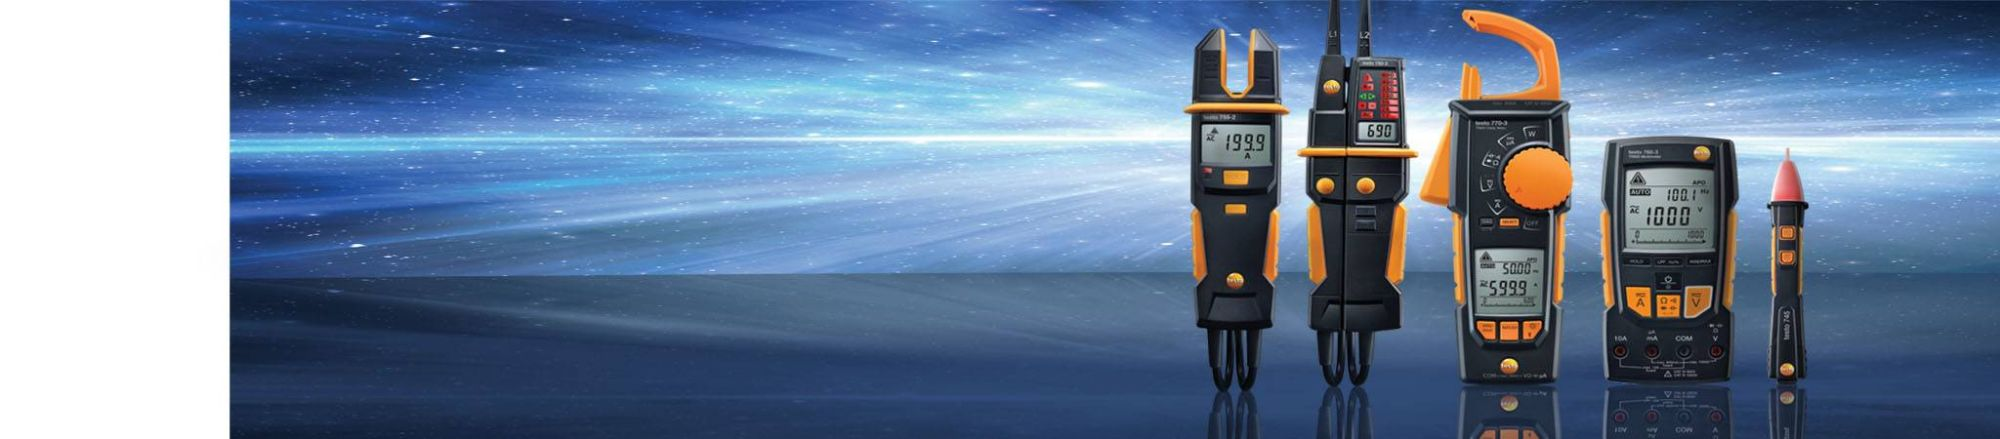 Tehnologia <br />măsurătorilor <br />electrice <br /><strong>reinventată.</strong>